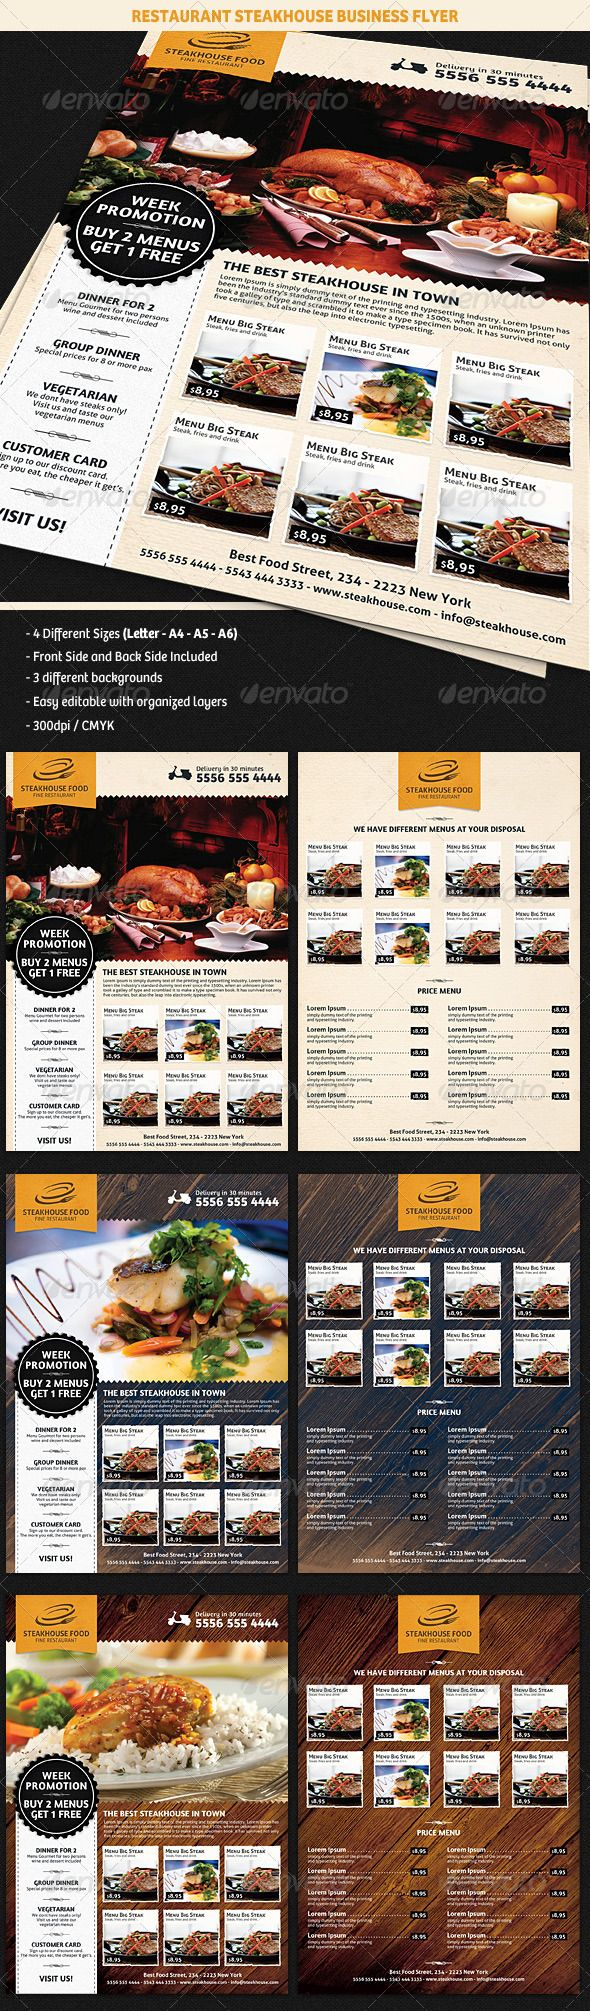 best images about ads restaurant winter 17 best images about ads restaurant winter and promotion